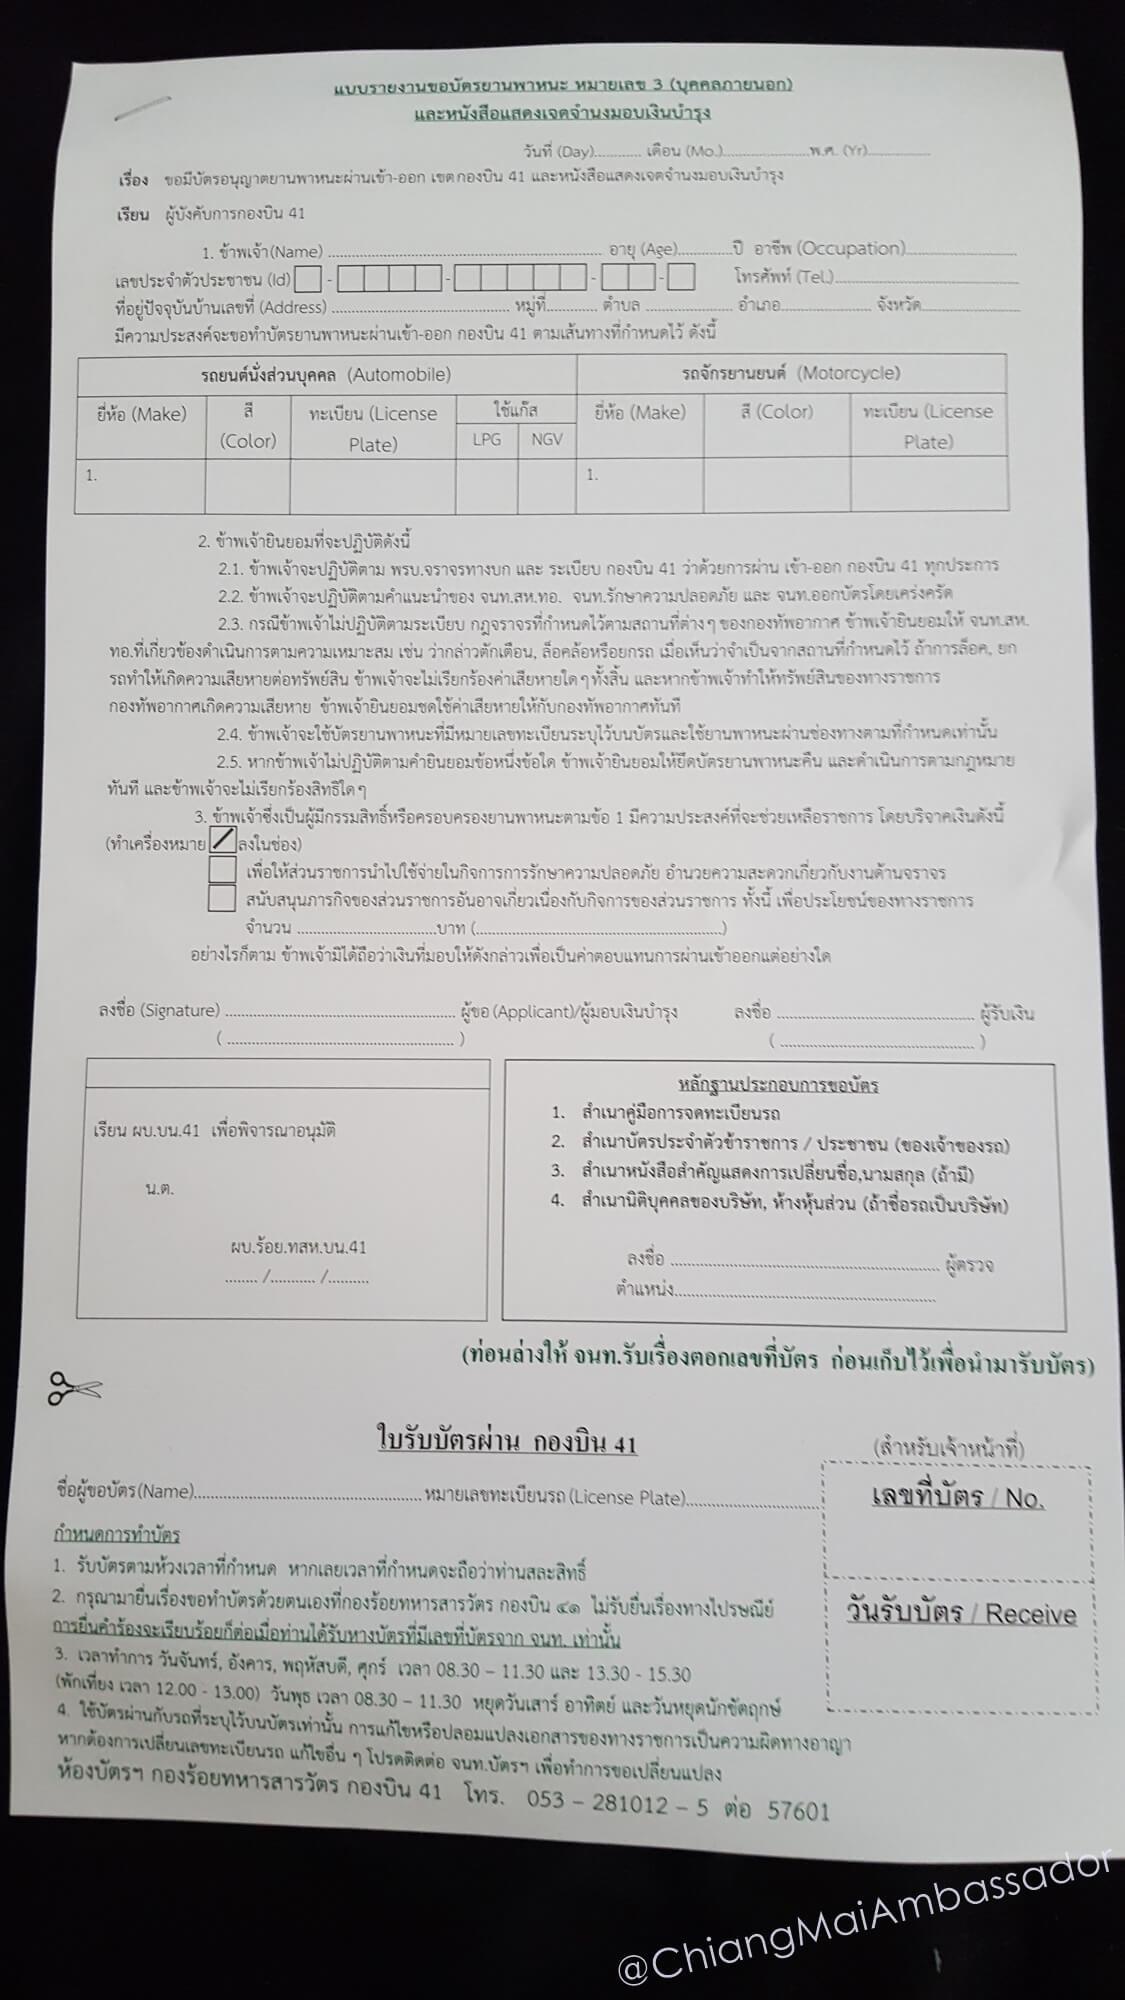 Chiang Mai Ambassador Wing 41 Pass Form